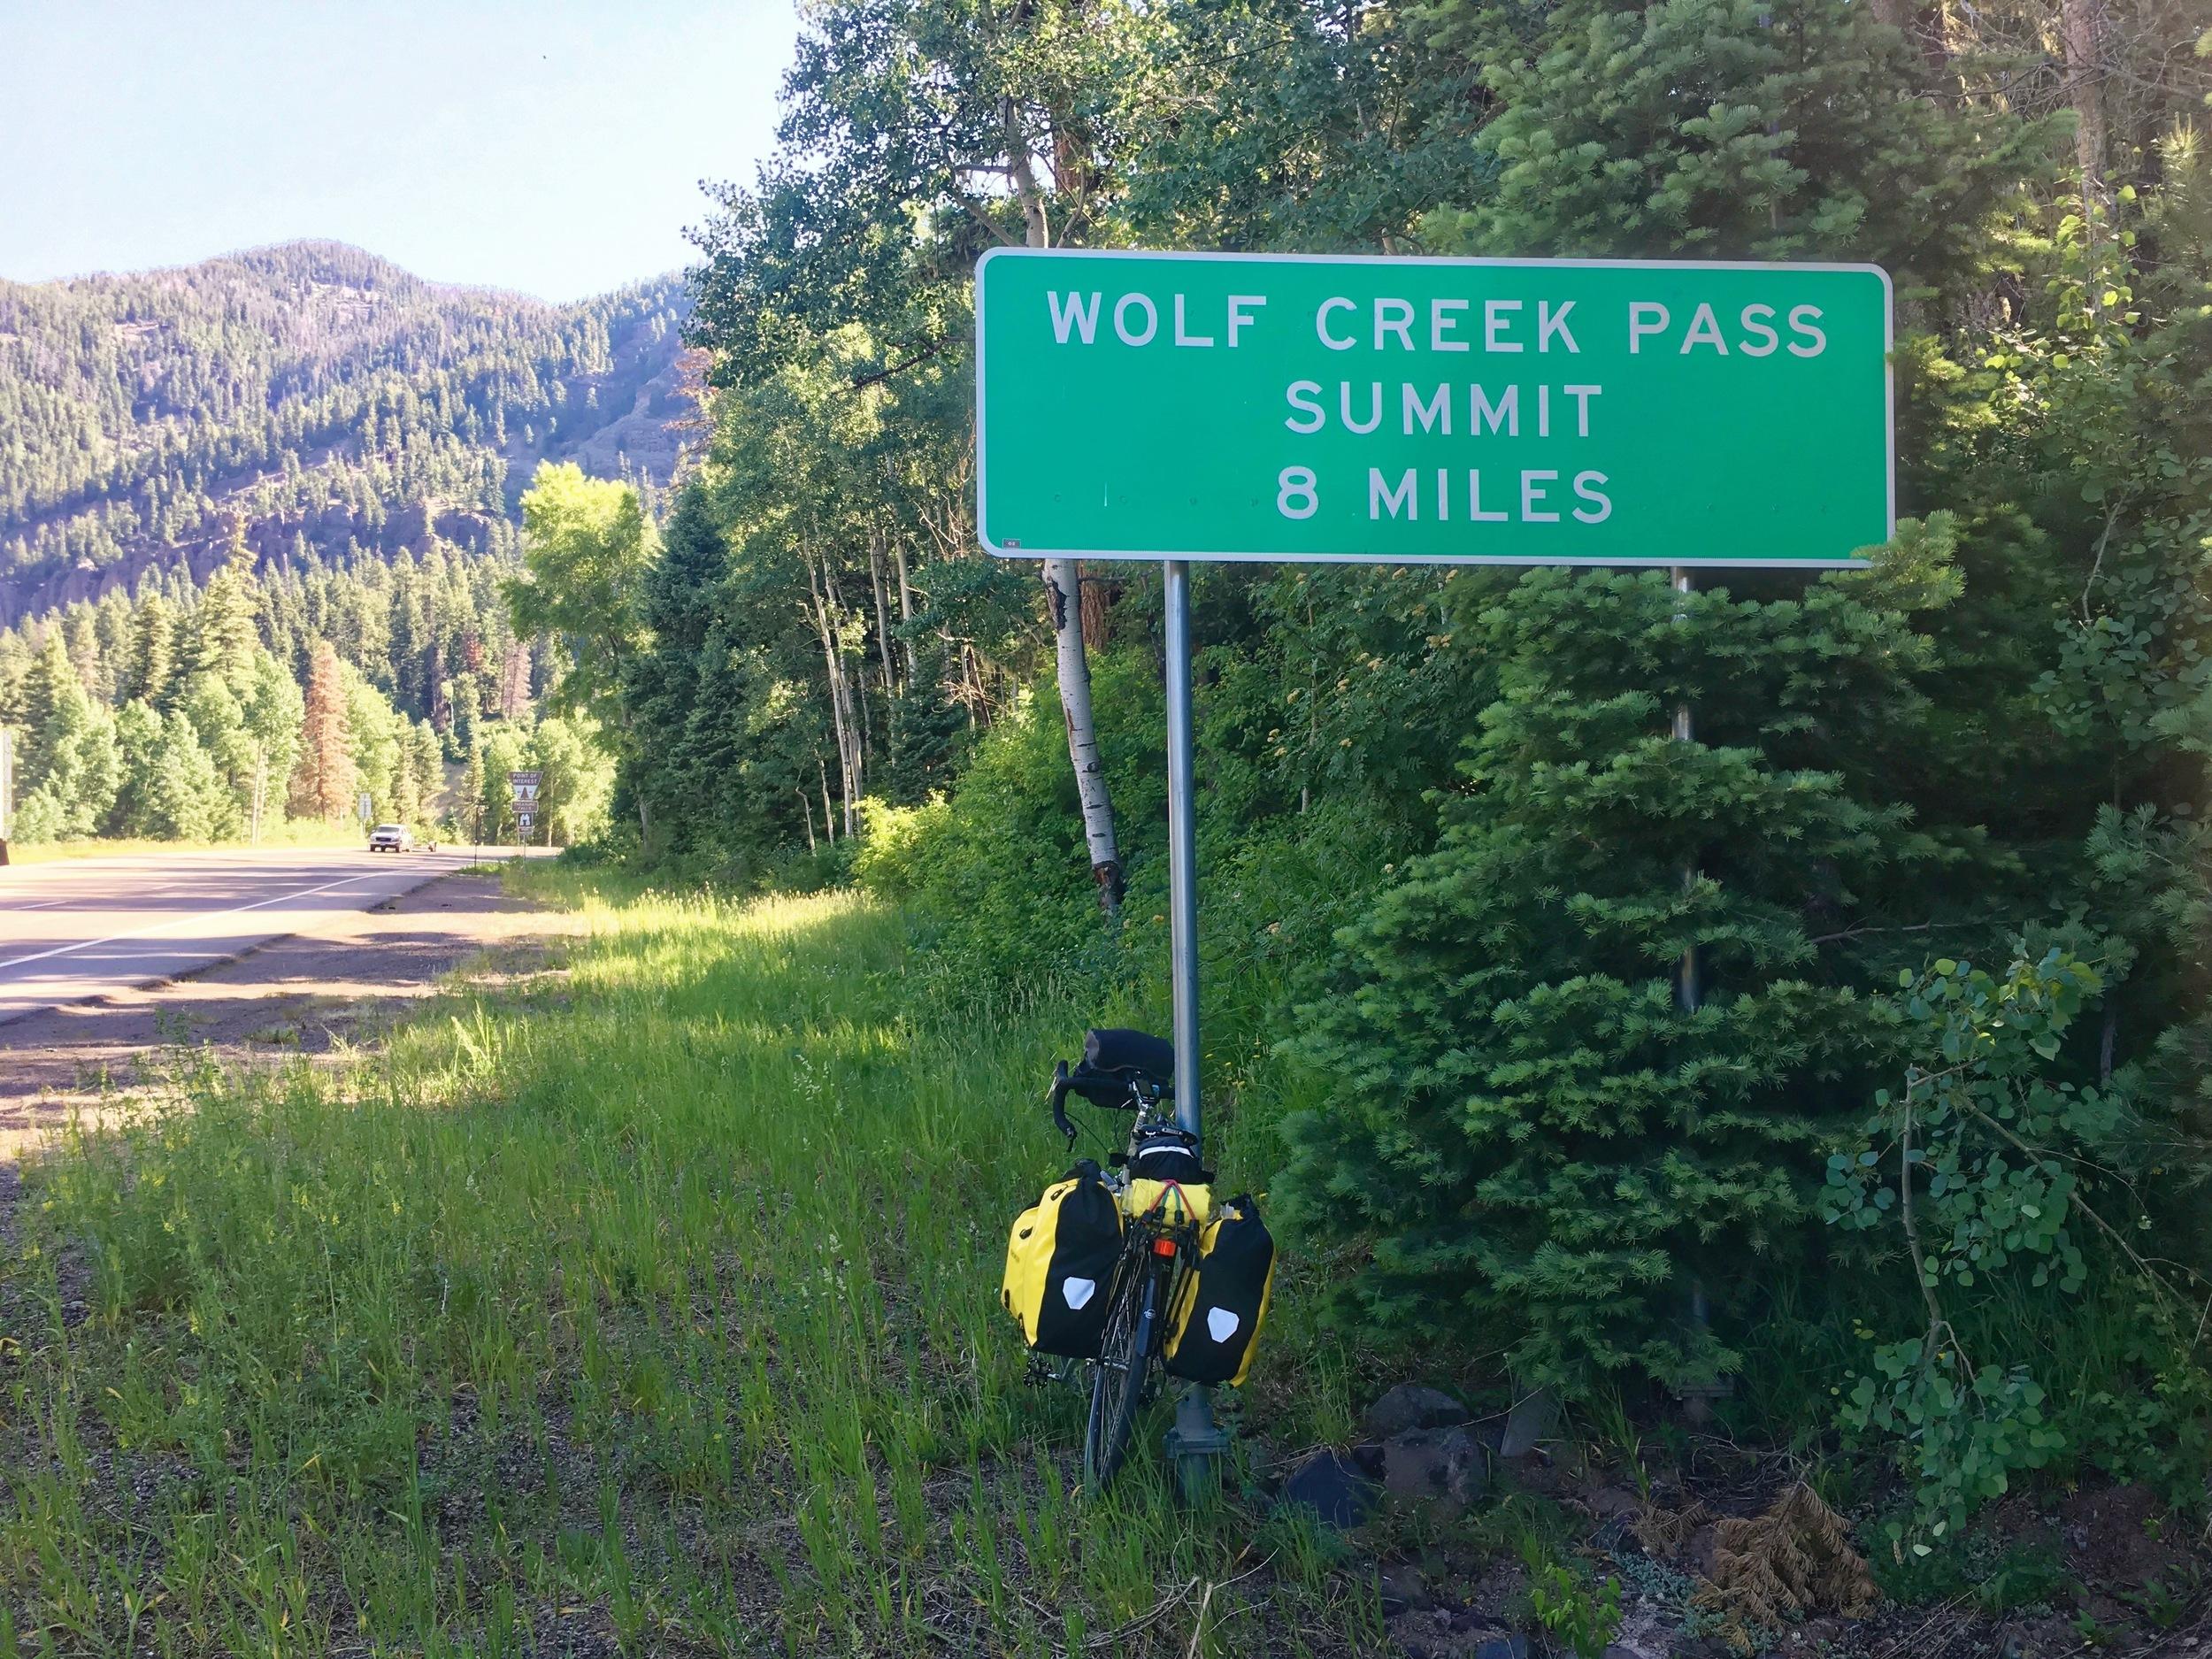 8 miles plus 8% grades = tired guy .